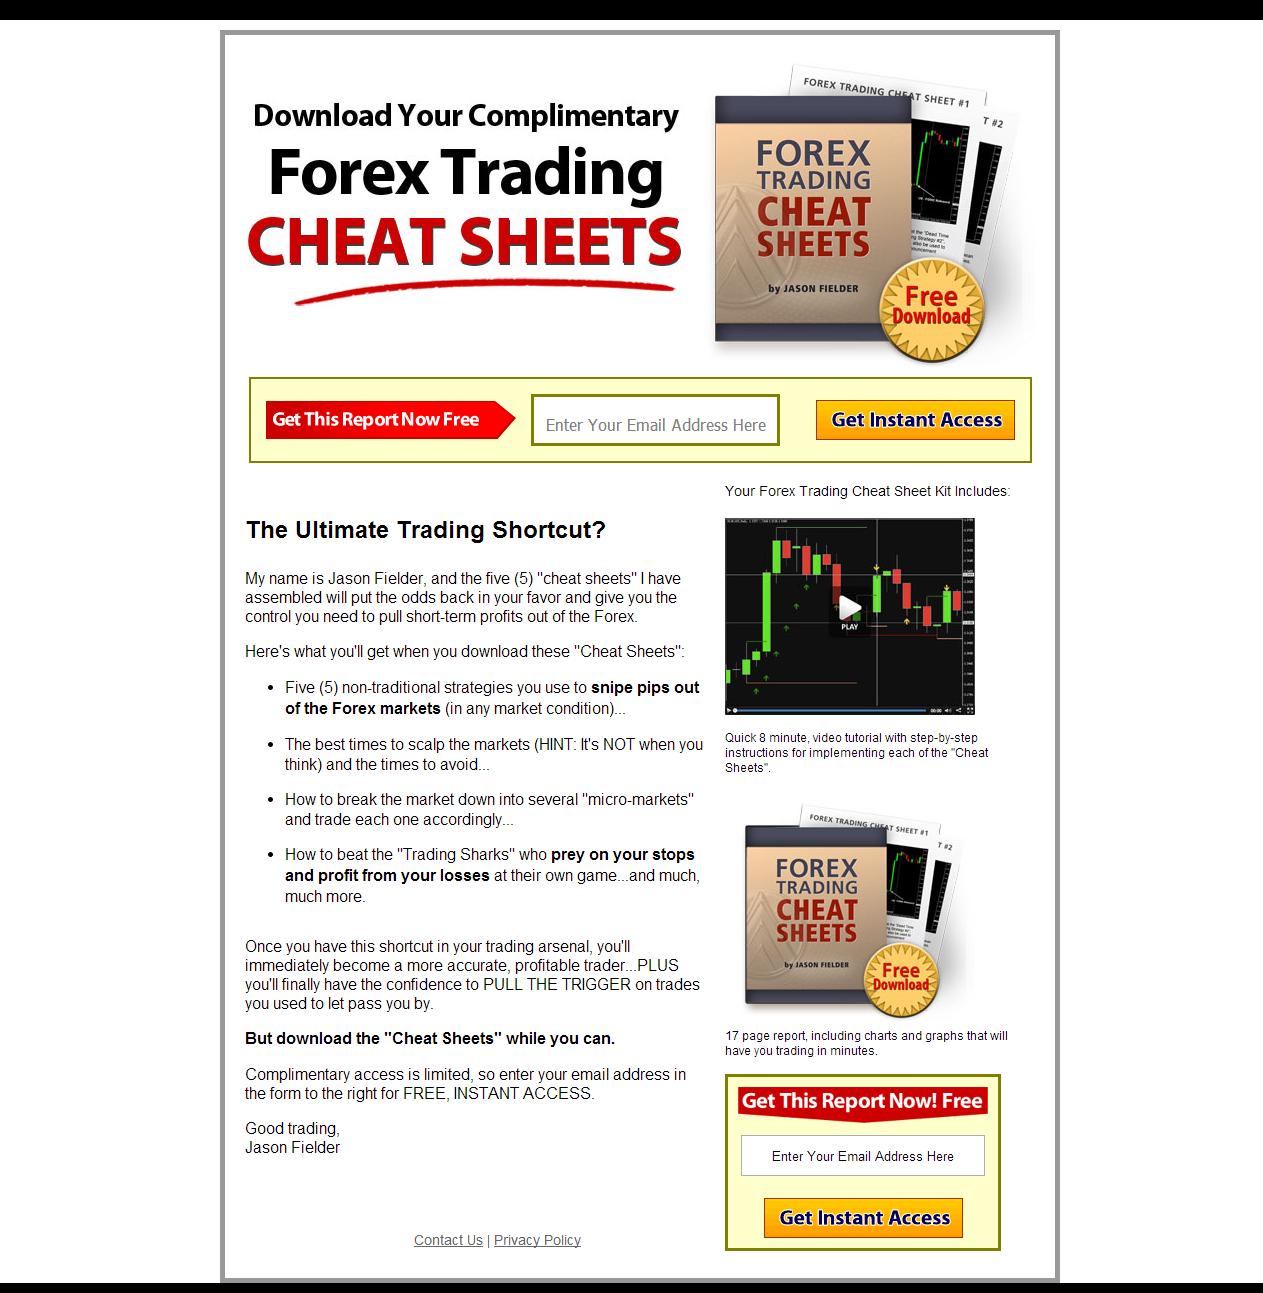 Football trading strategies free pdf download